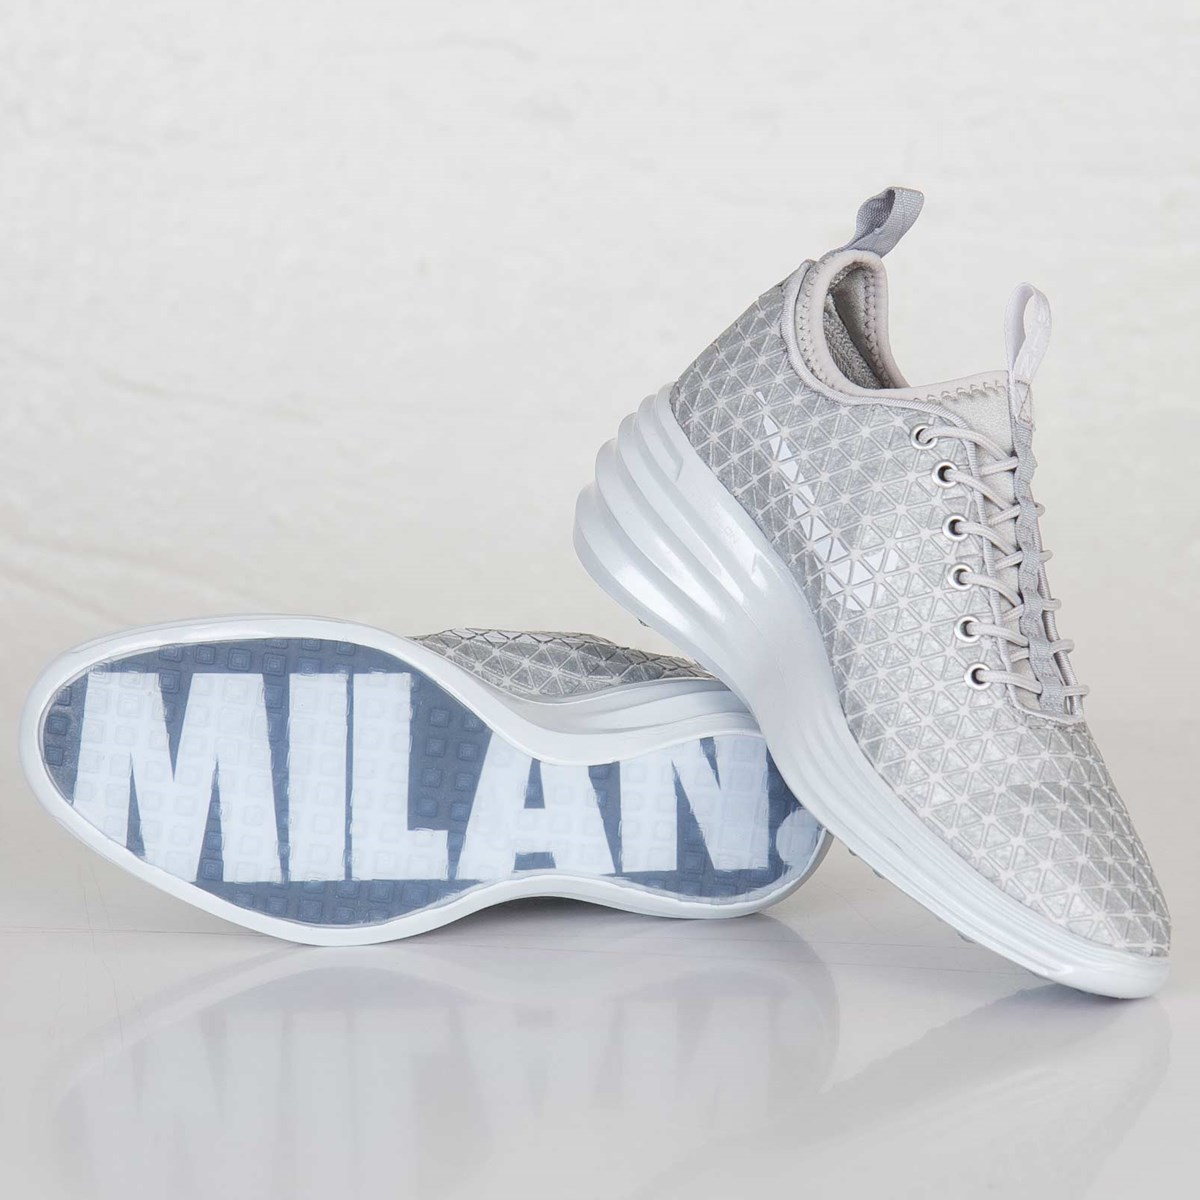 new product d8d5e 01142 Nike Wmns Lunarelite Sky Hi FW QS - 652902-001 - Sneakersnstuff   sneakers    streetwear online since 1999